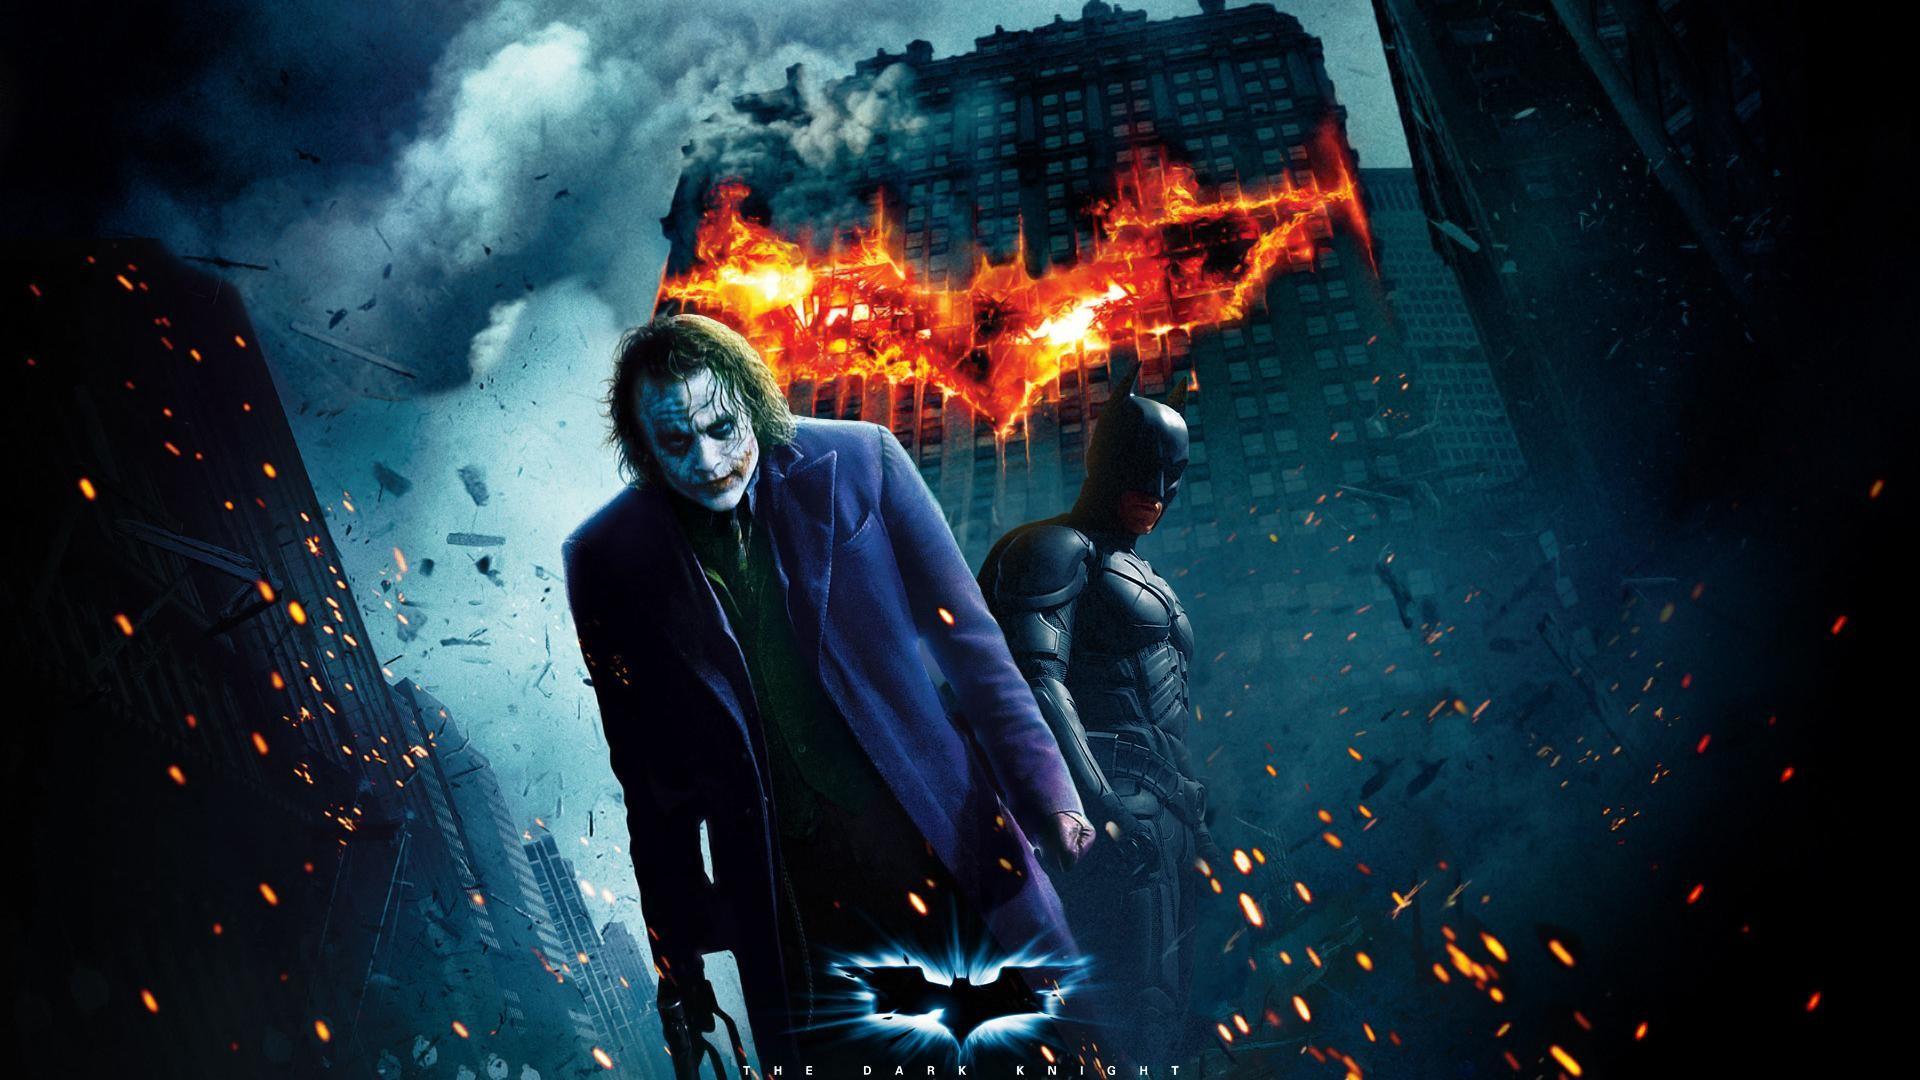 cool batman the dark knight wallpaper joker hd Image Batman the joker  batman the dark knight hd wallpapers